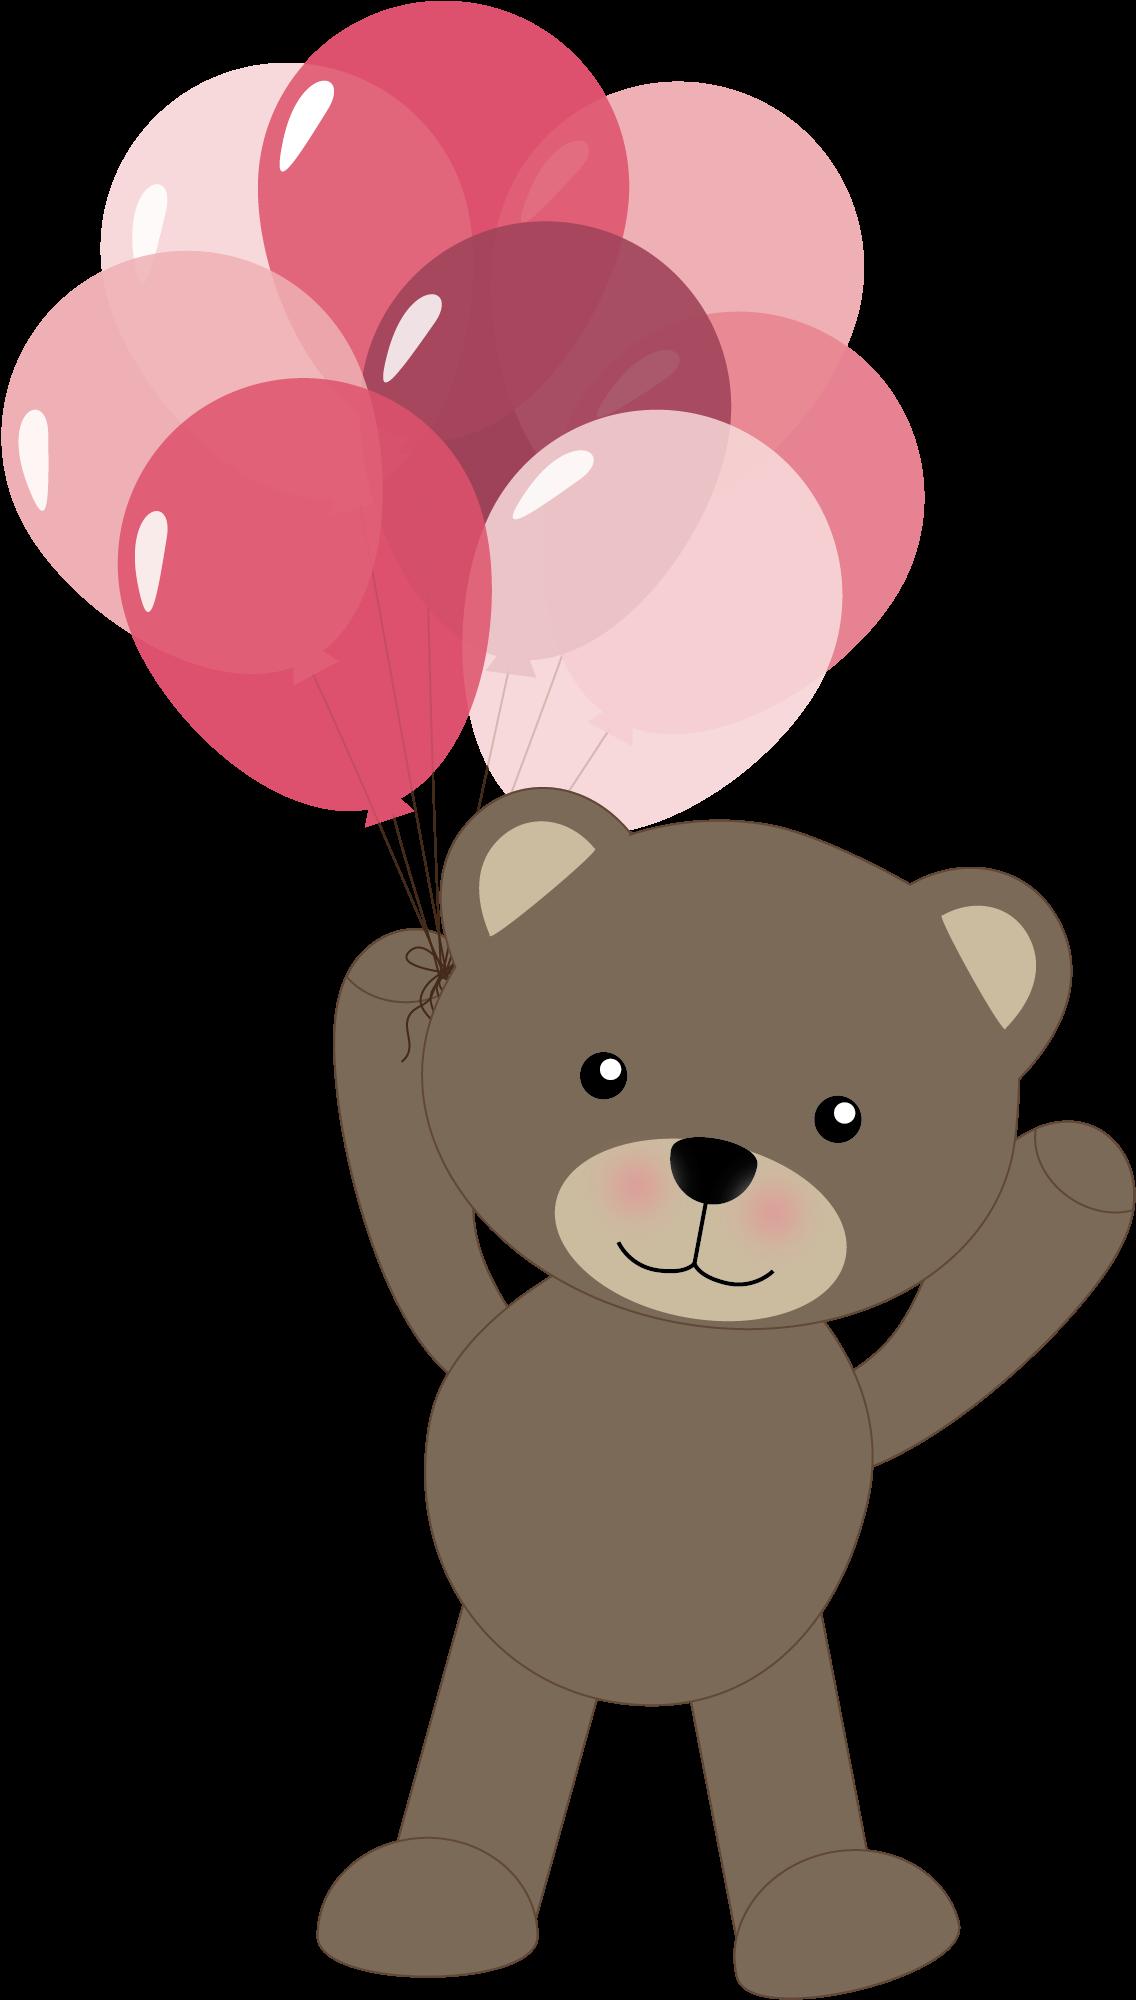 Transparent little brother clipart - B *✿* Clipart Oso, Cute Clipart, Urso Bear, Teddy - Teddy Bear Clipart With Balloons